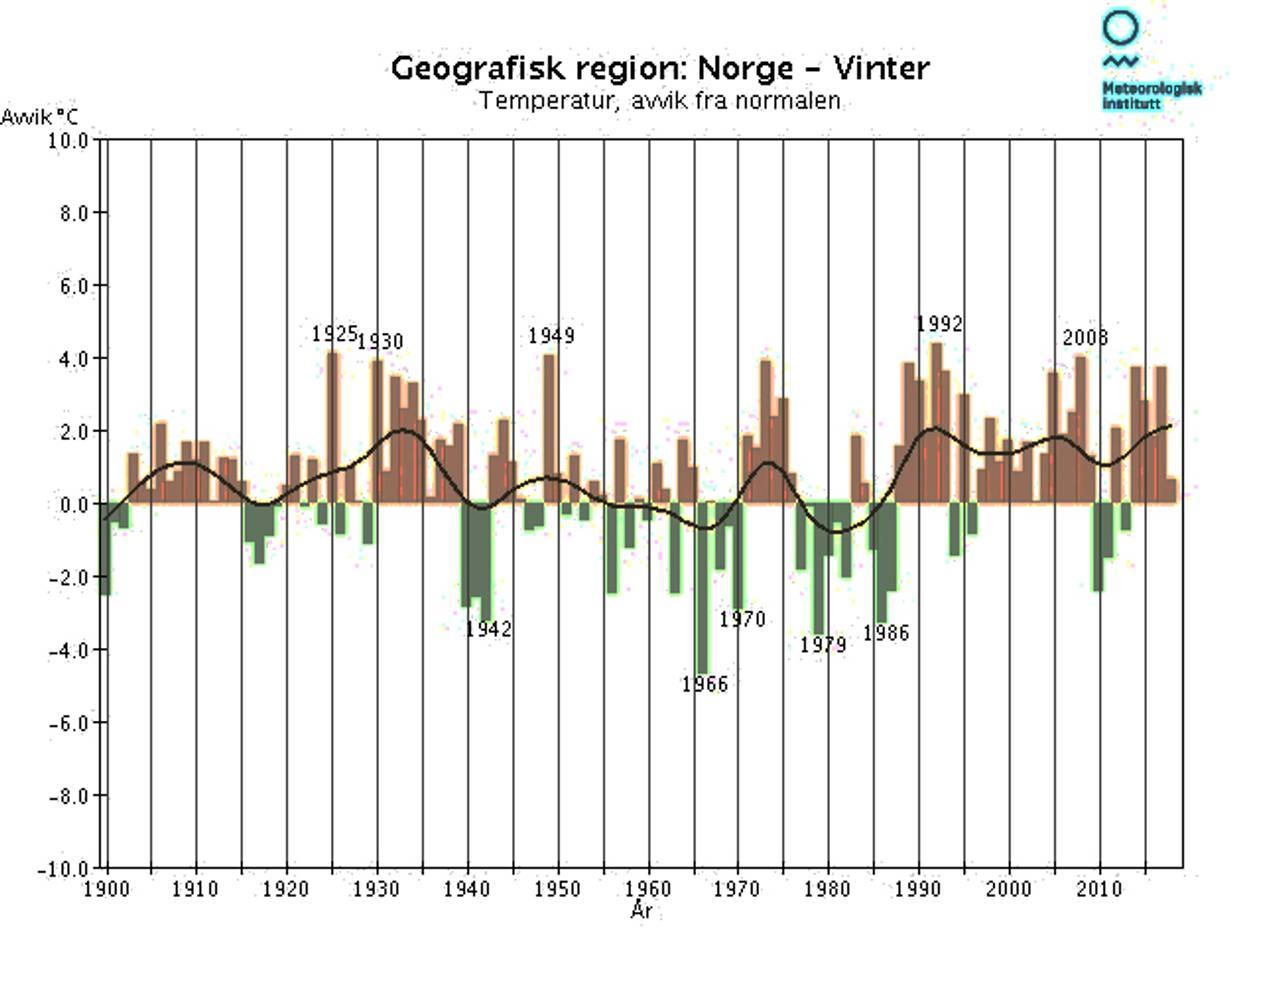 Temperatur-utvikling i Norge om vinteren 1900-2018